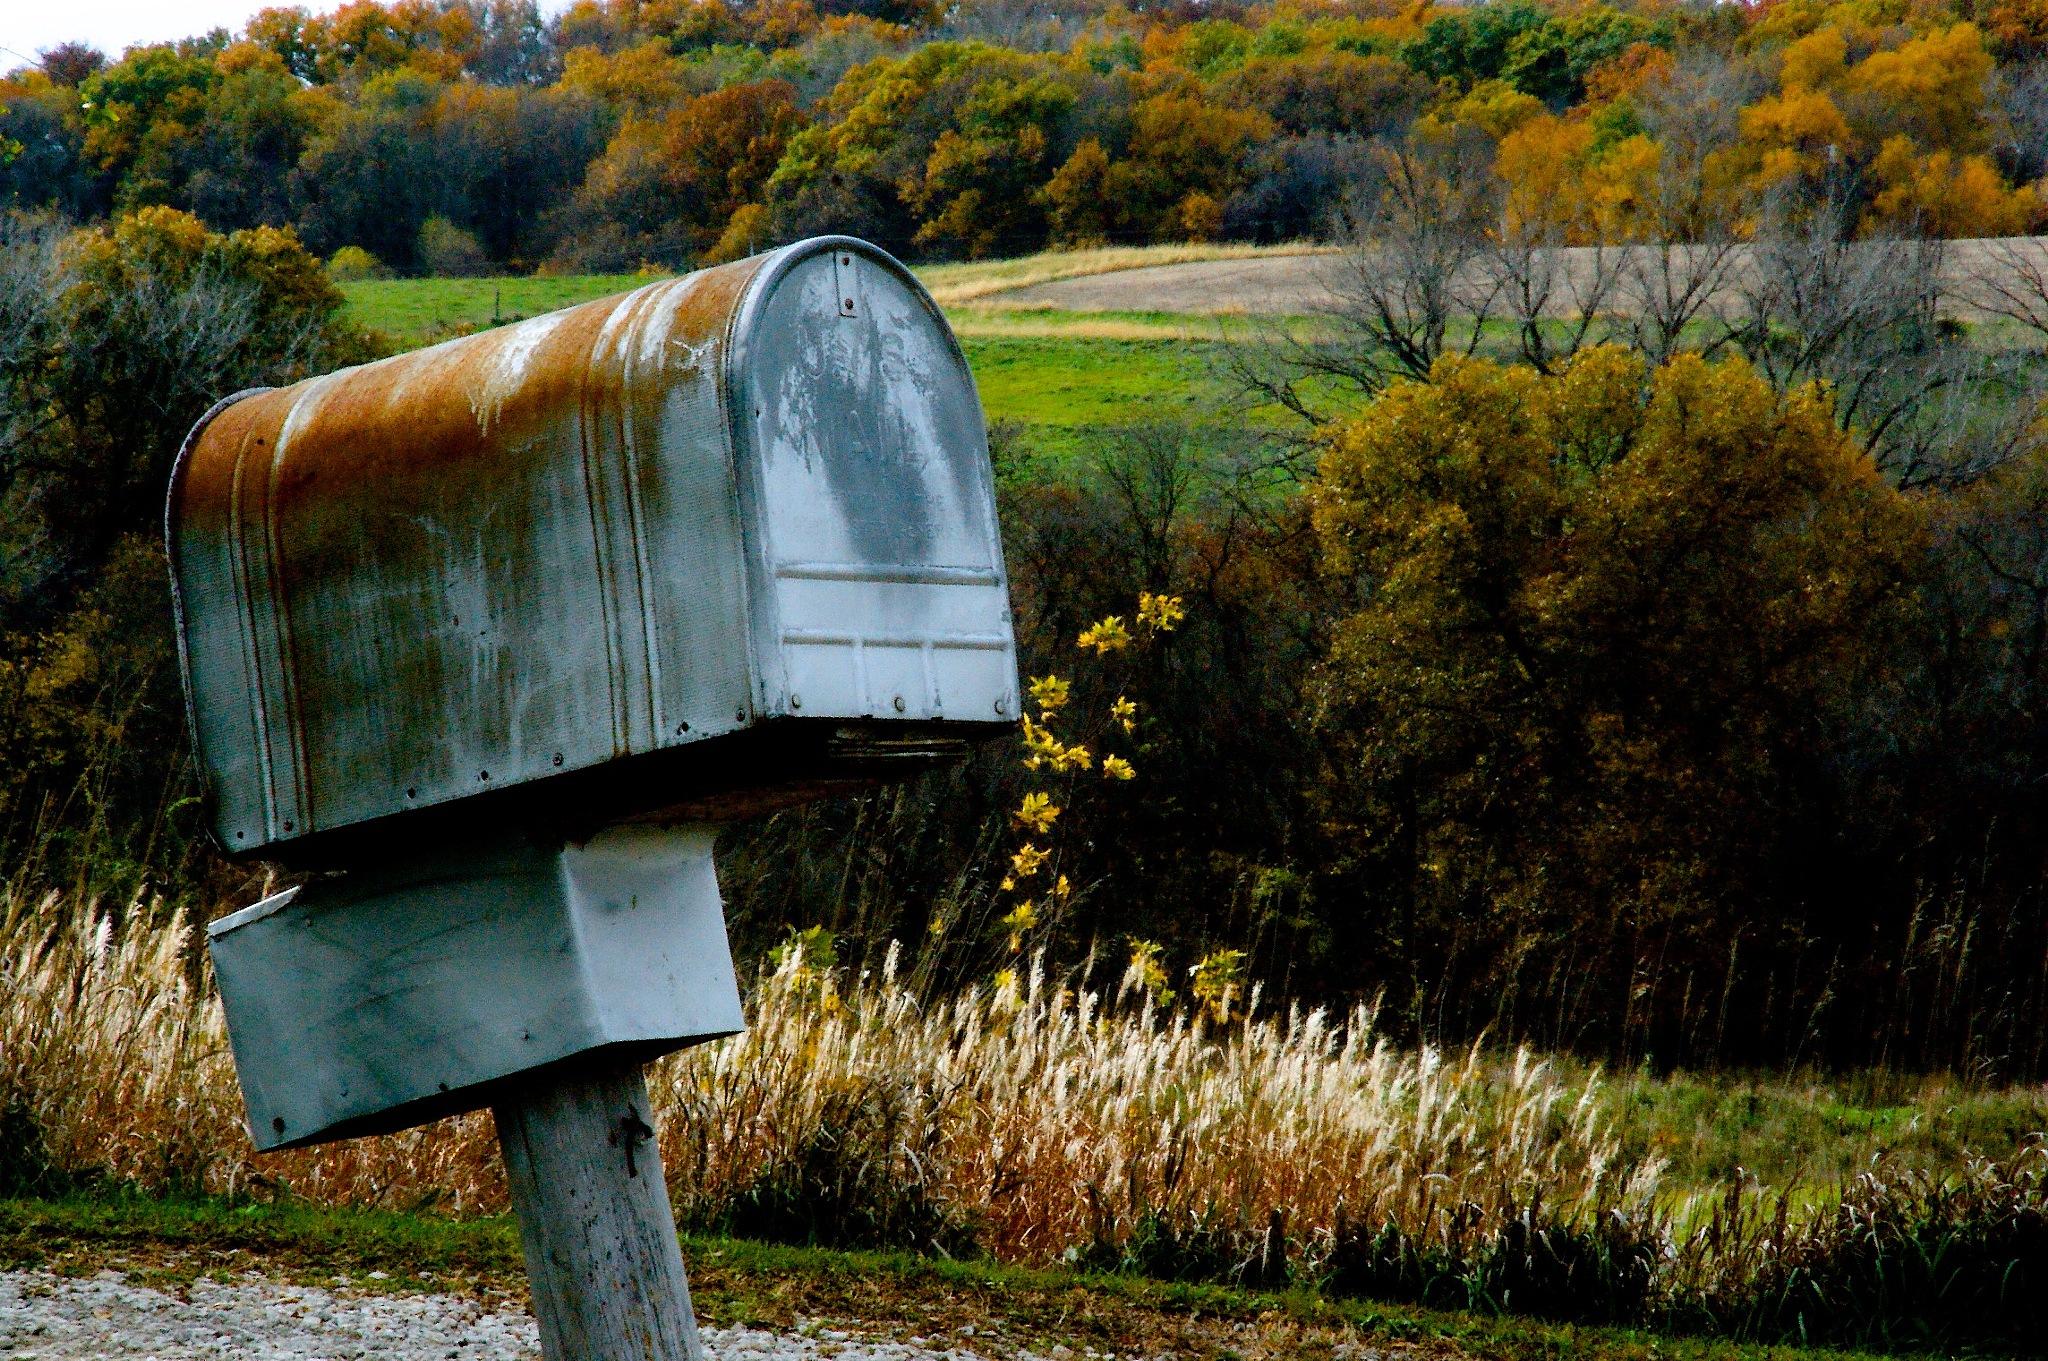 The Farmers Box by John Schmoll